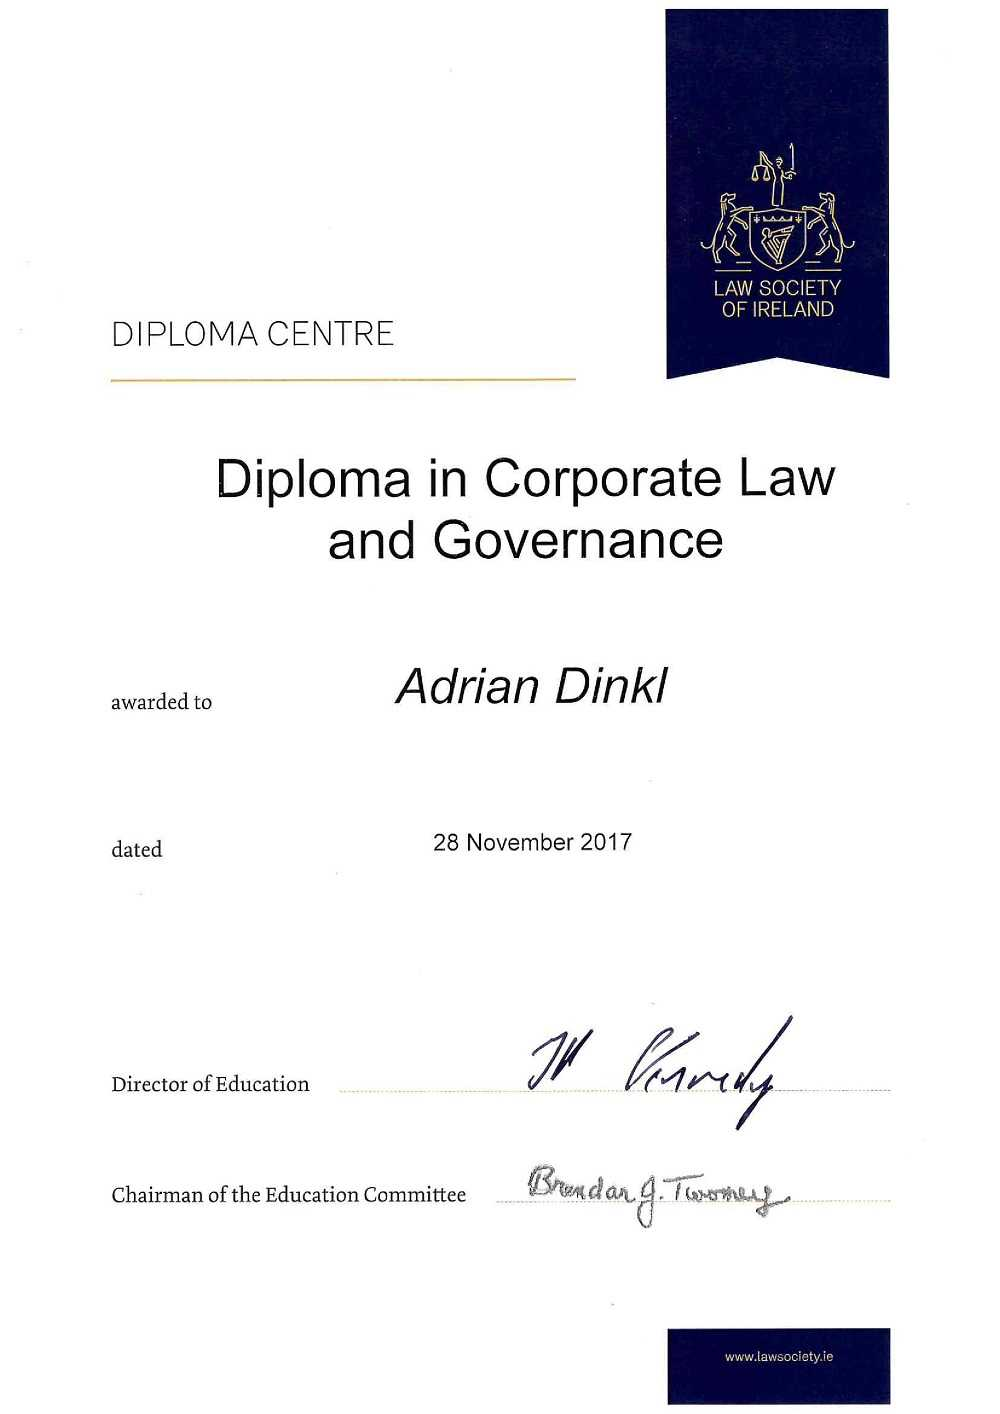 Adrian-Dinkl-Diploma